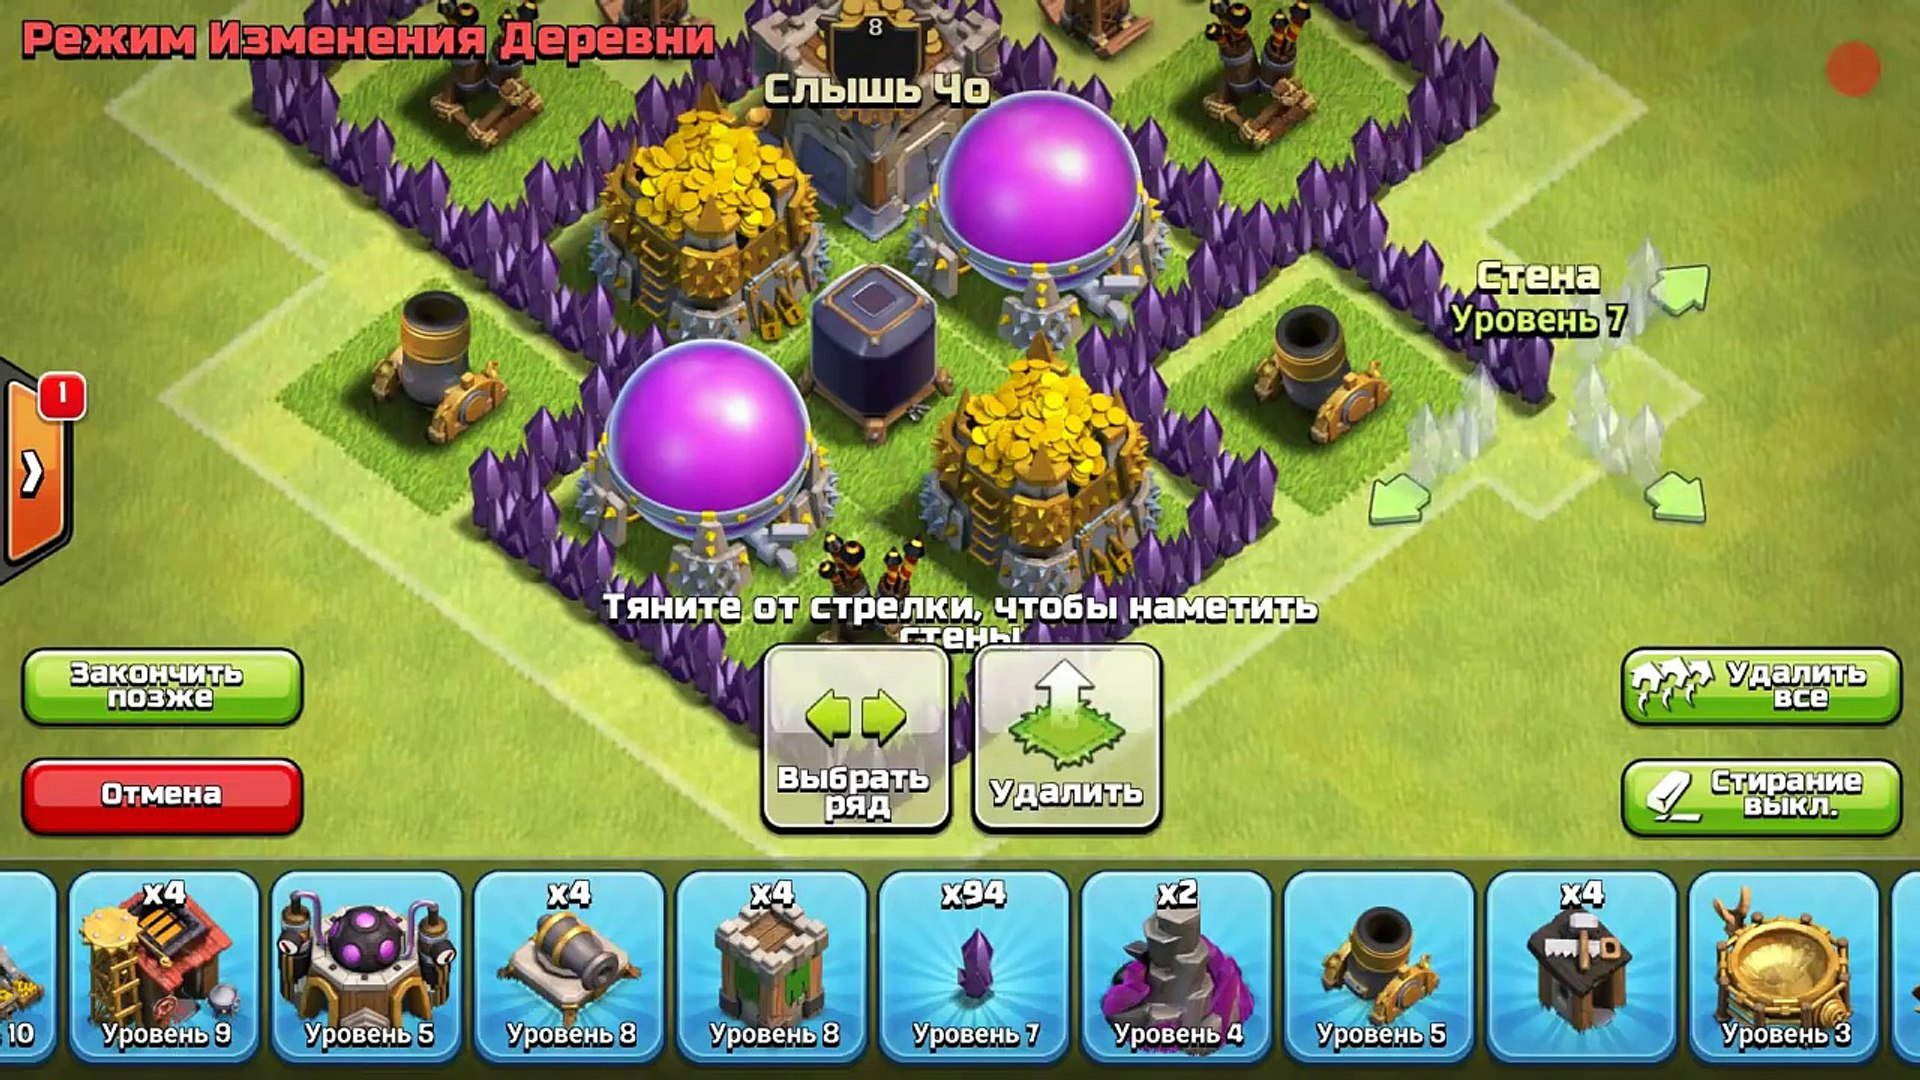 Clash of clans тх 7 фарм база (защиты ресурсов).th7 farm base